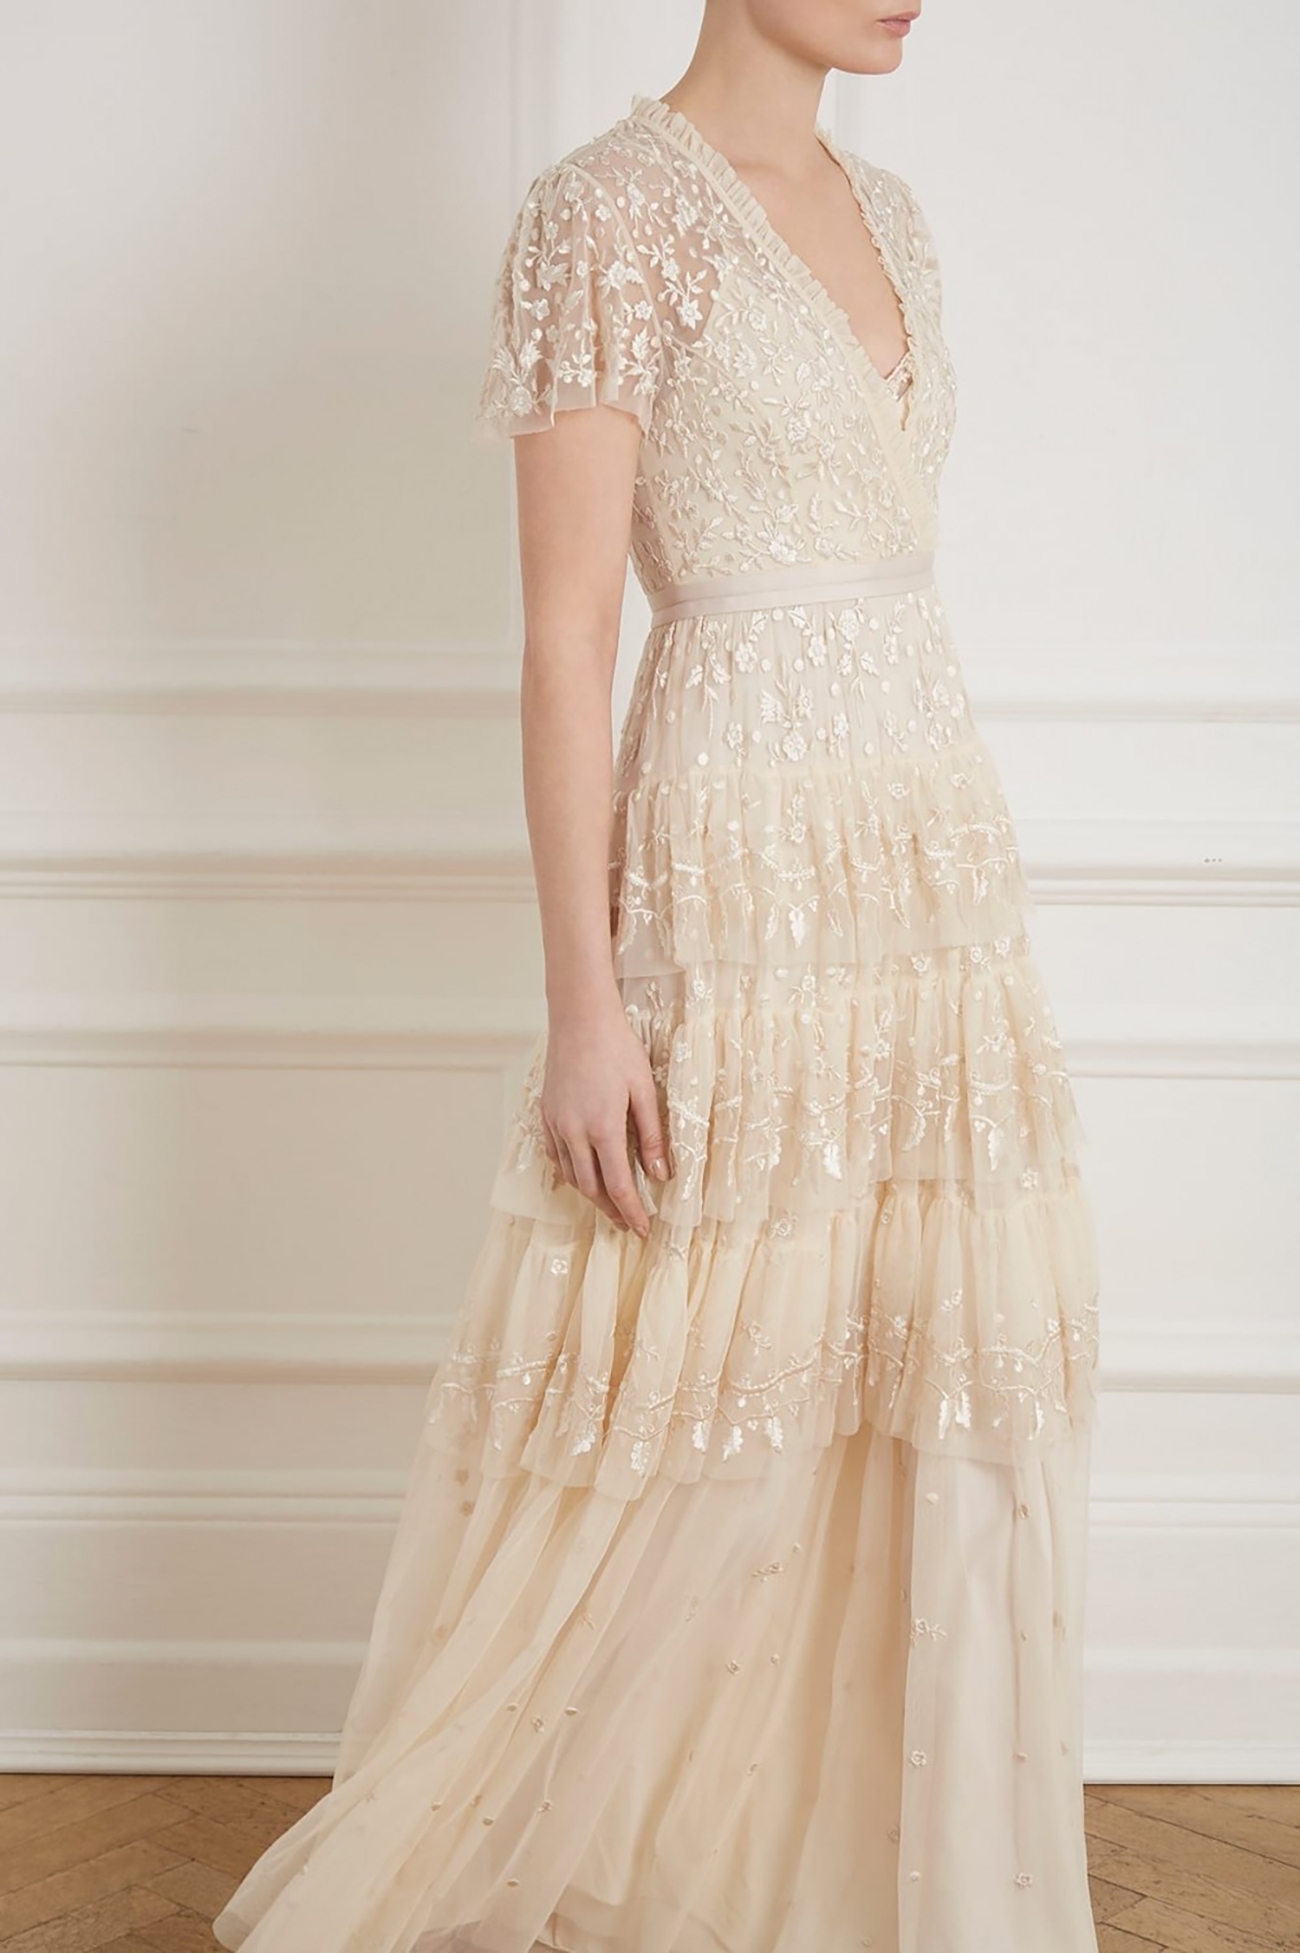 Lace Wedding Dress Under $800 Budget